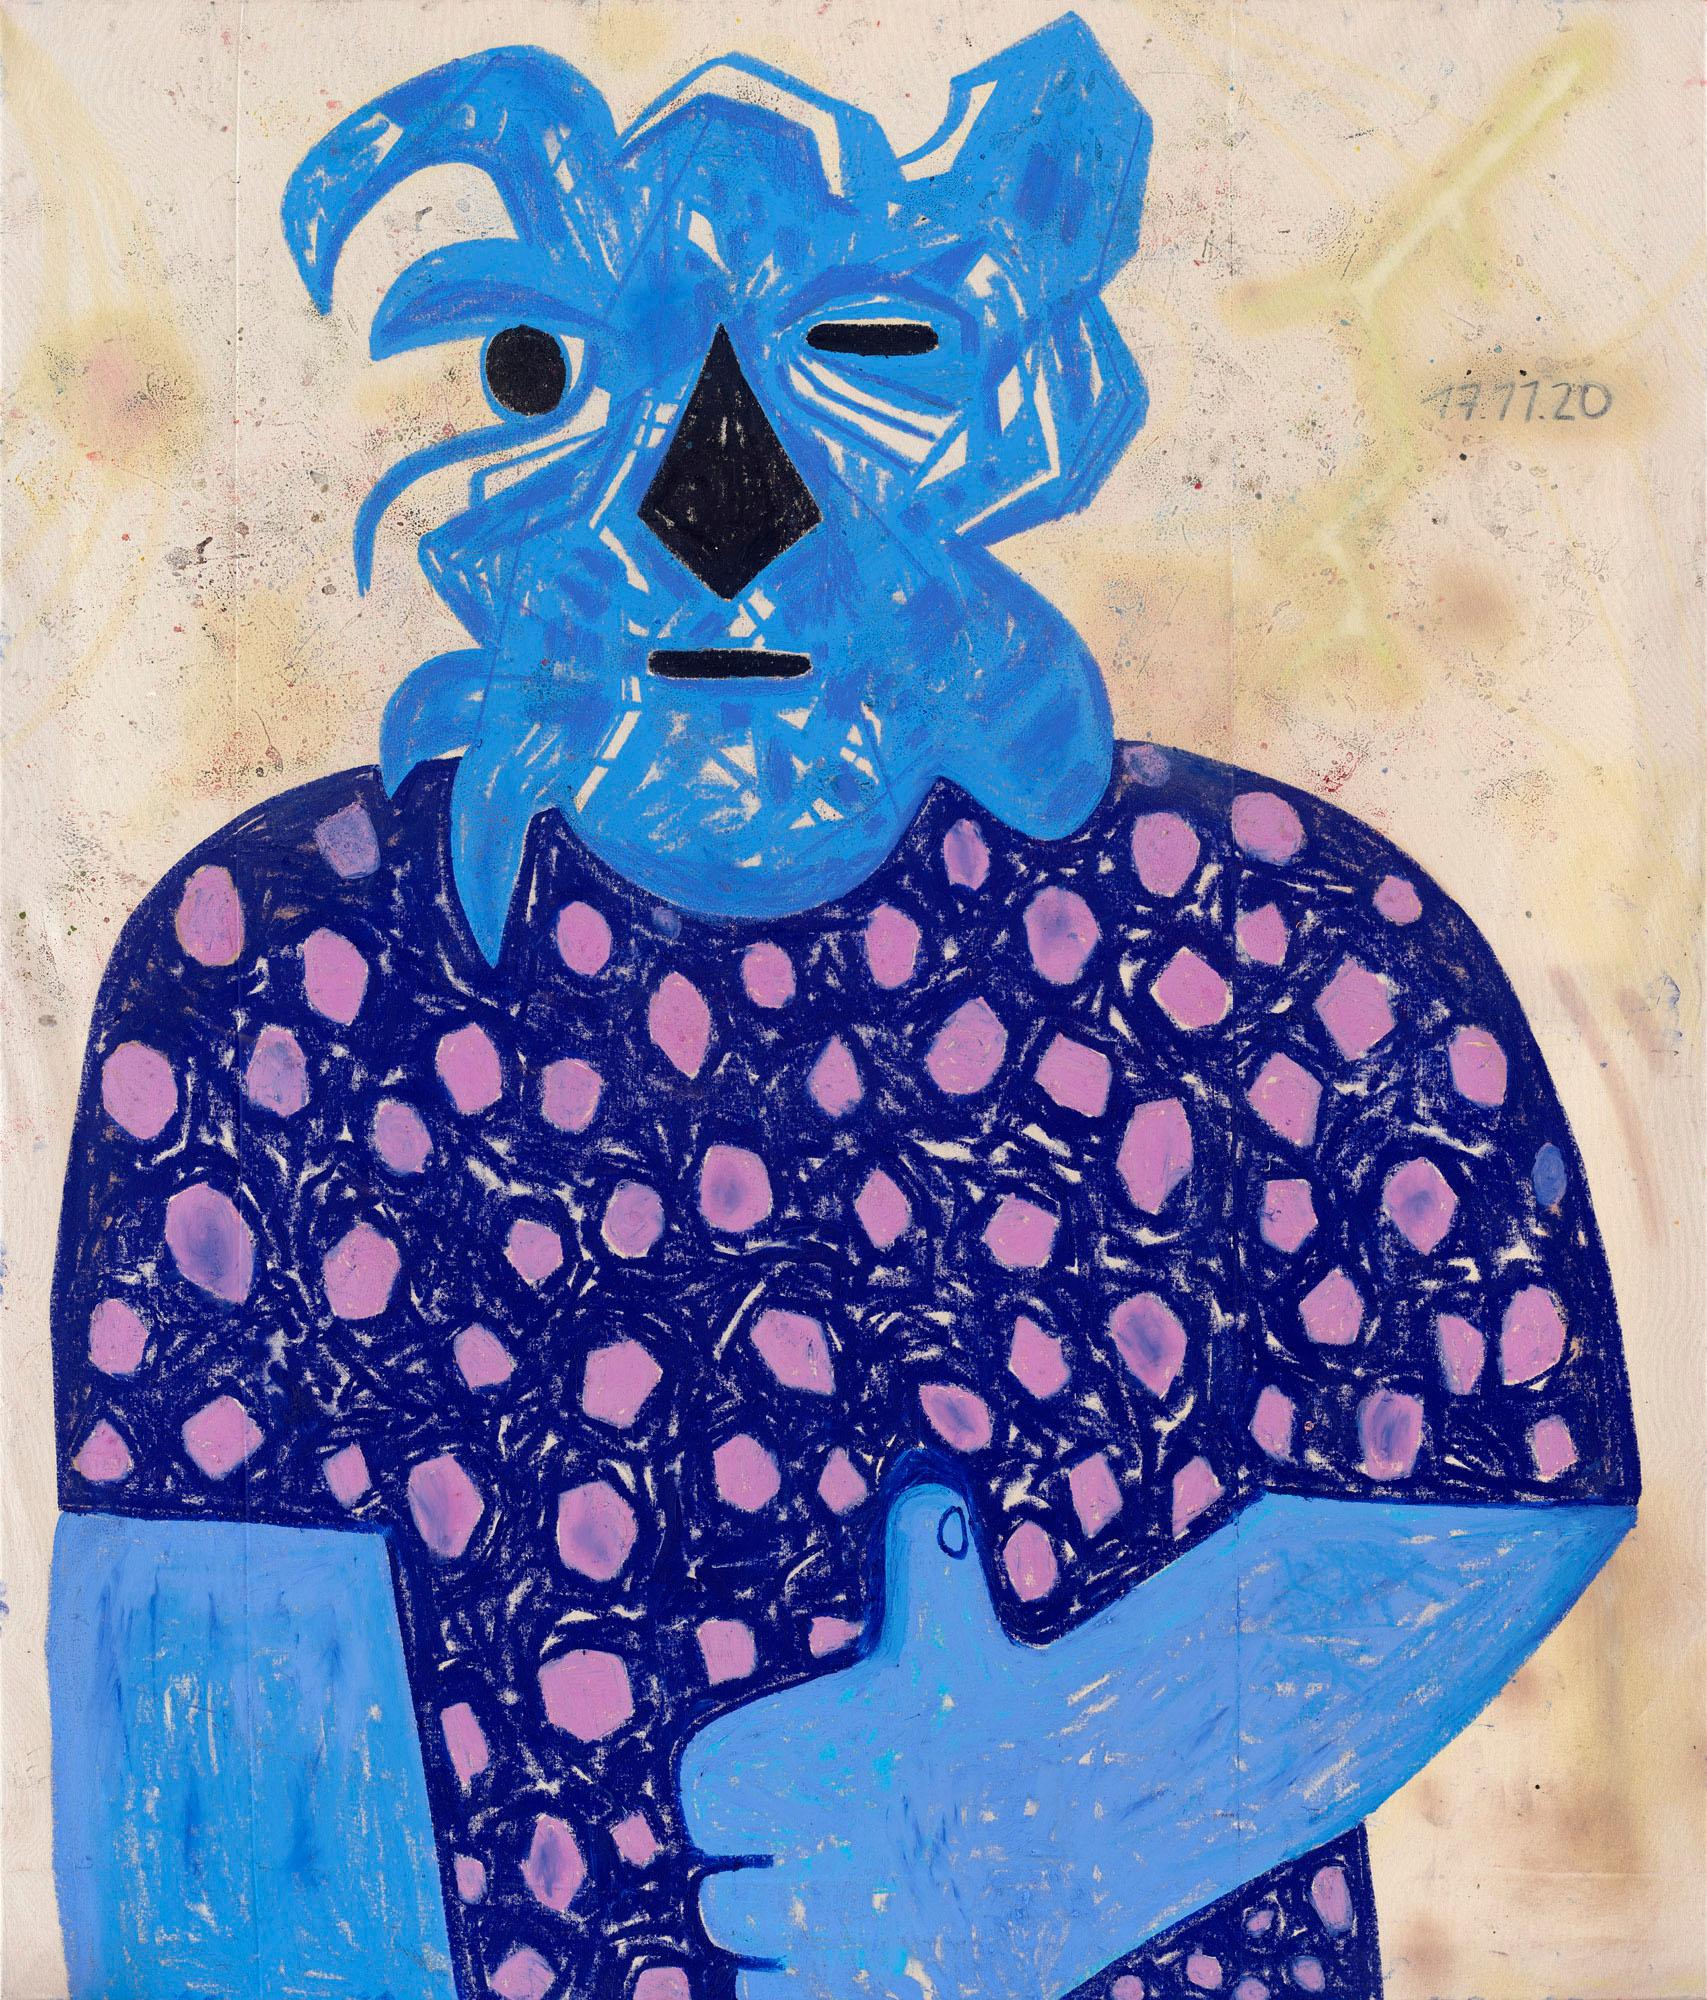 french contemporary painter, photographer, curator, graffiti artist